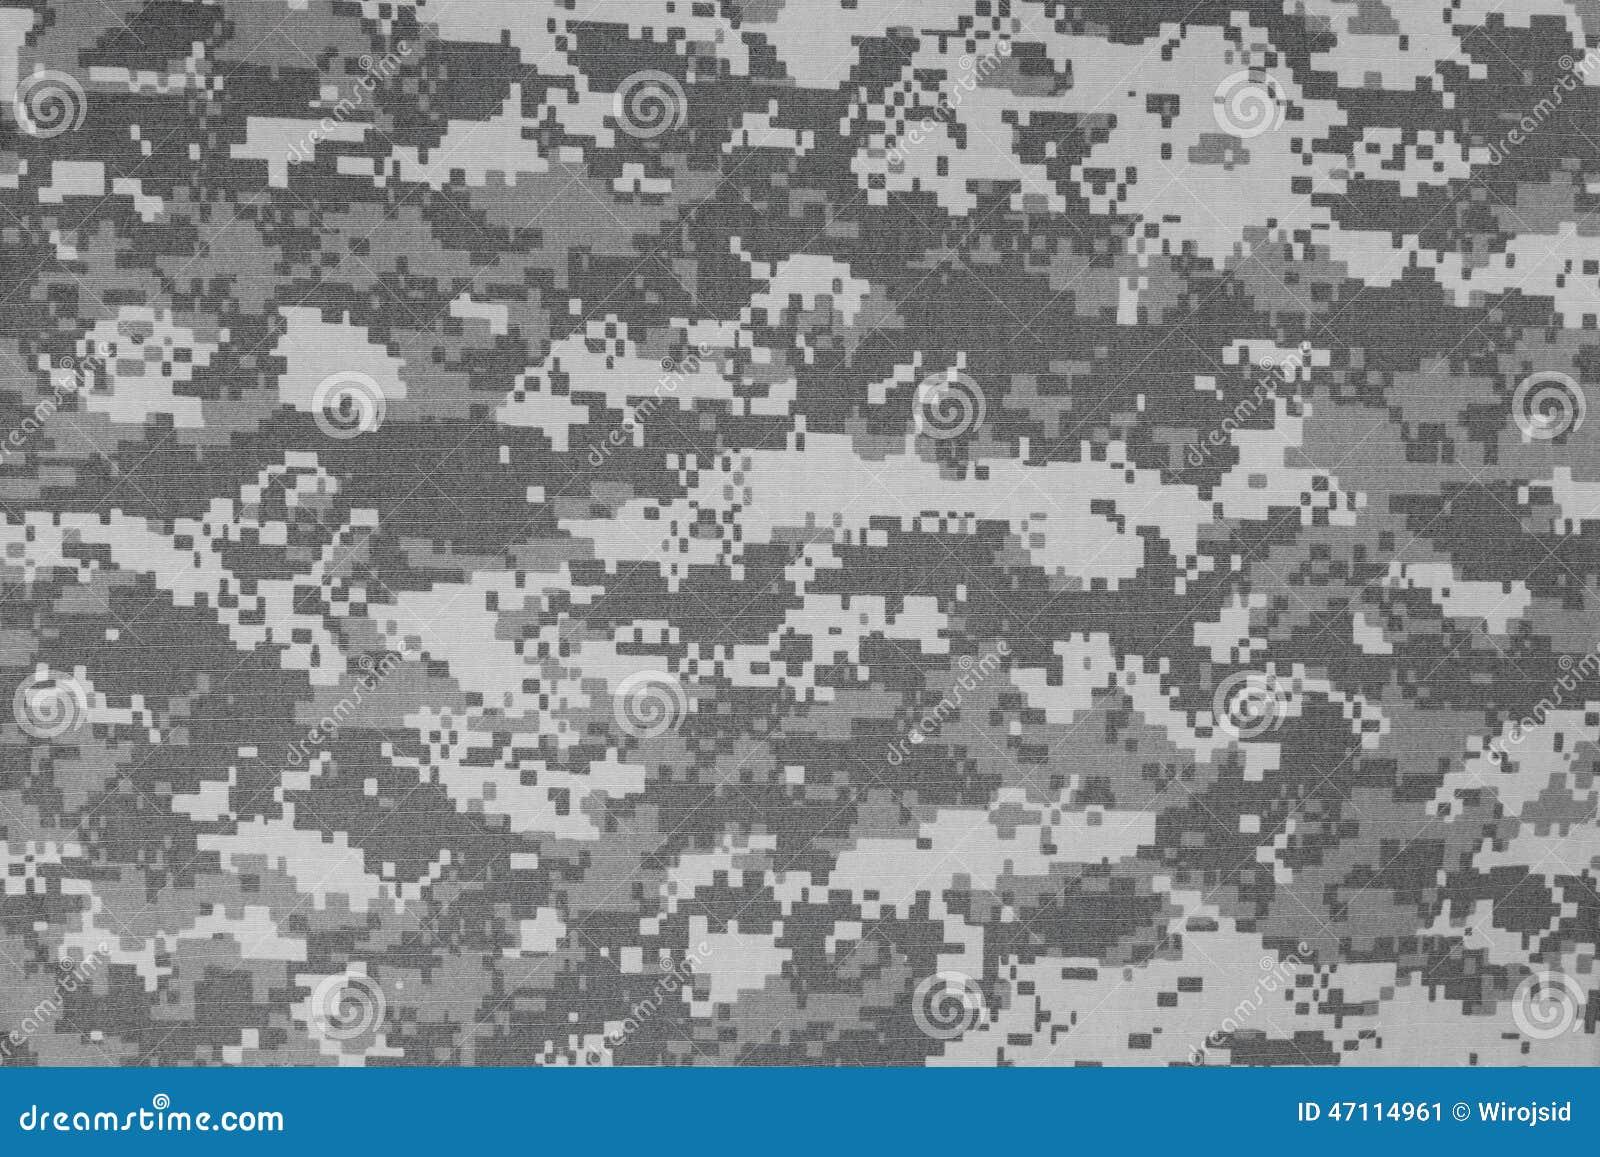 us army urban digital camouflage fabric texture stock Polar Bear Clip Art Bird Clip Art